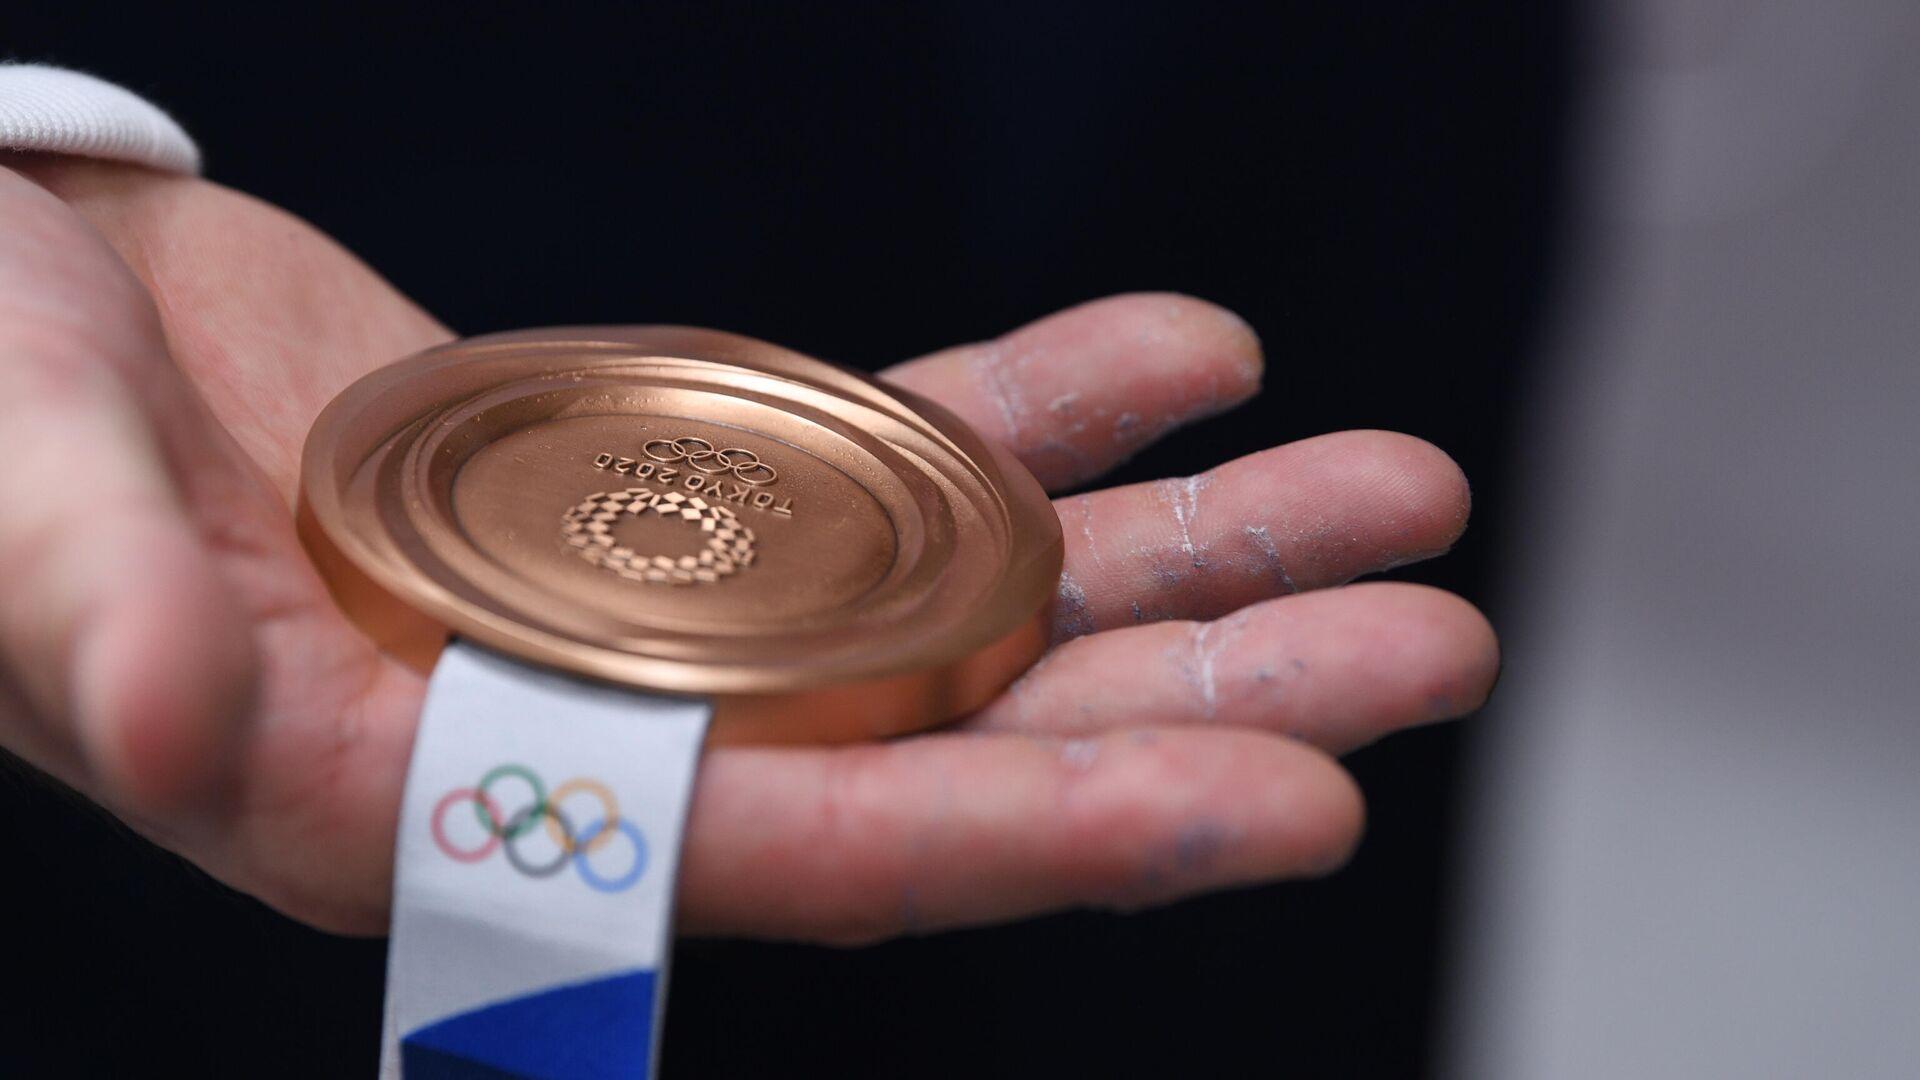 Medaglia di Bronzo, Tokyo 2020 - Sputnik Italia, 1920, 08.08.2021